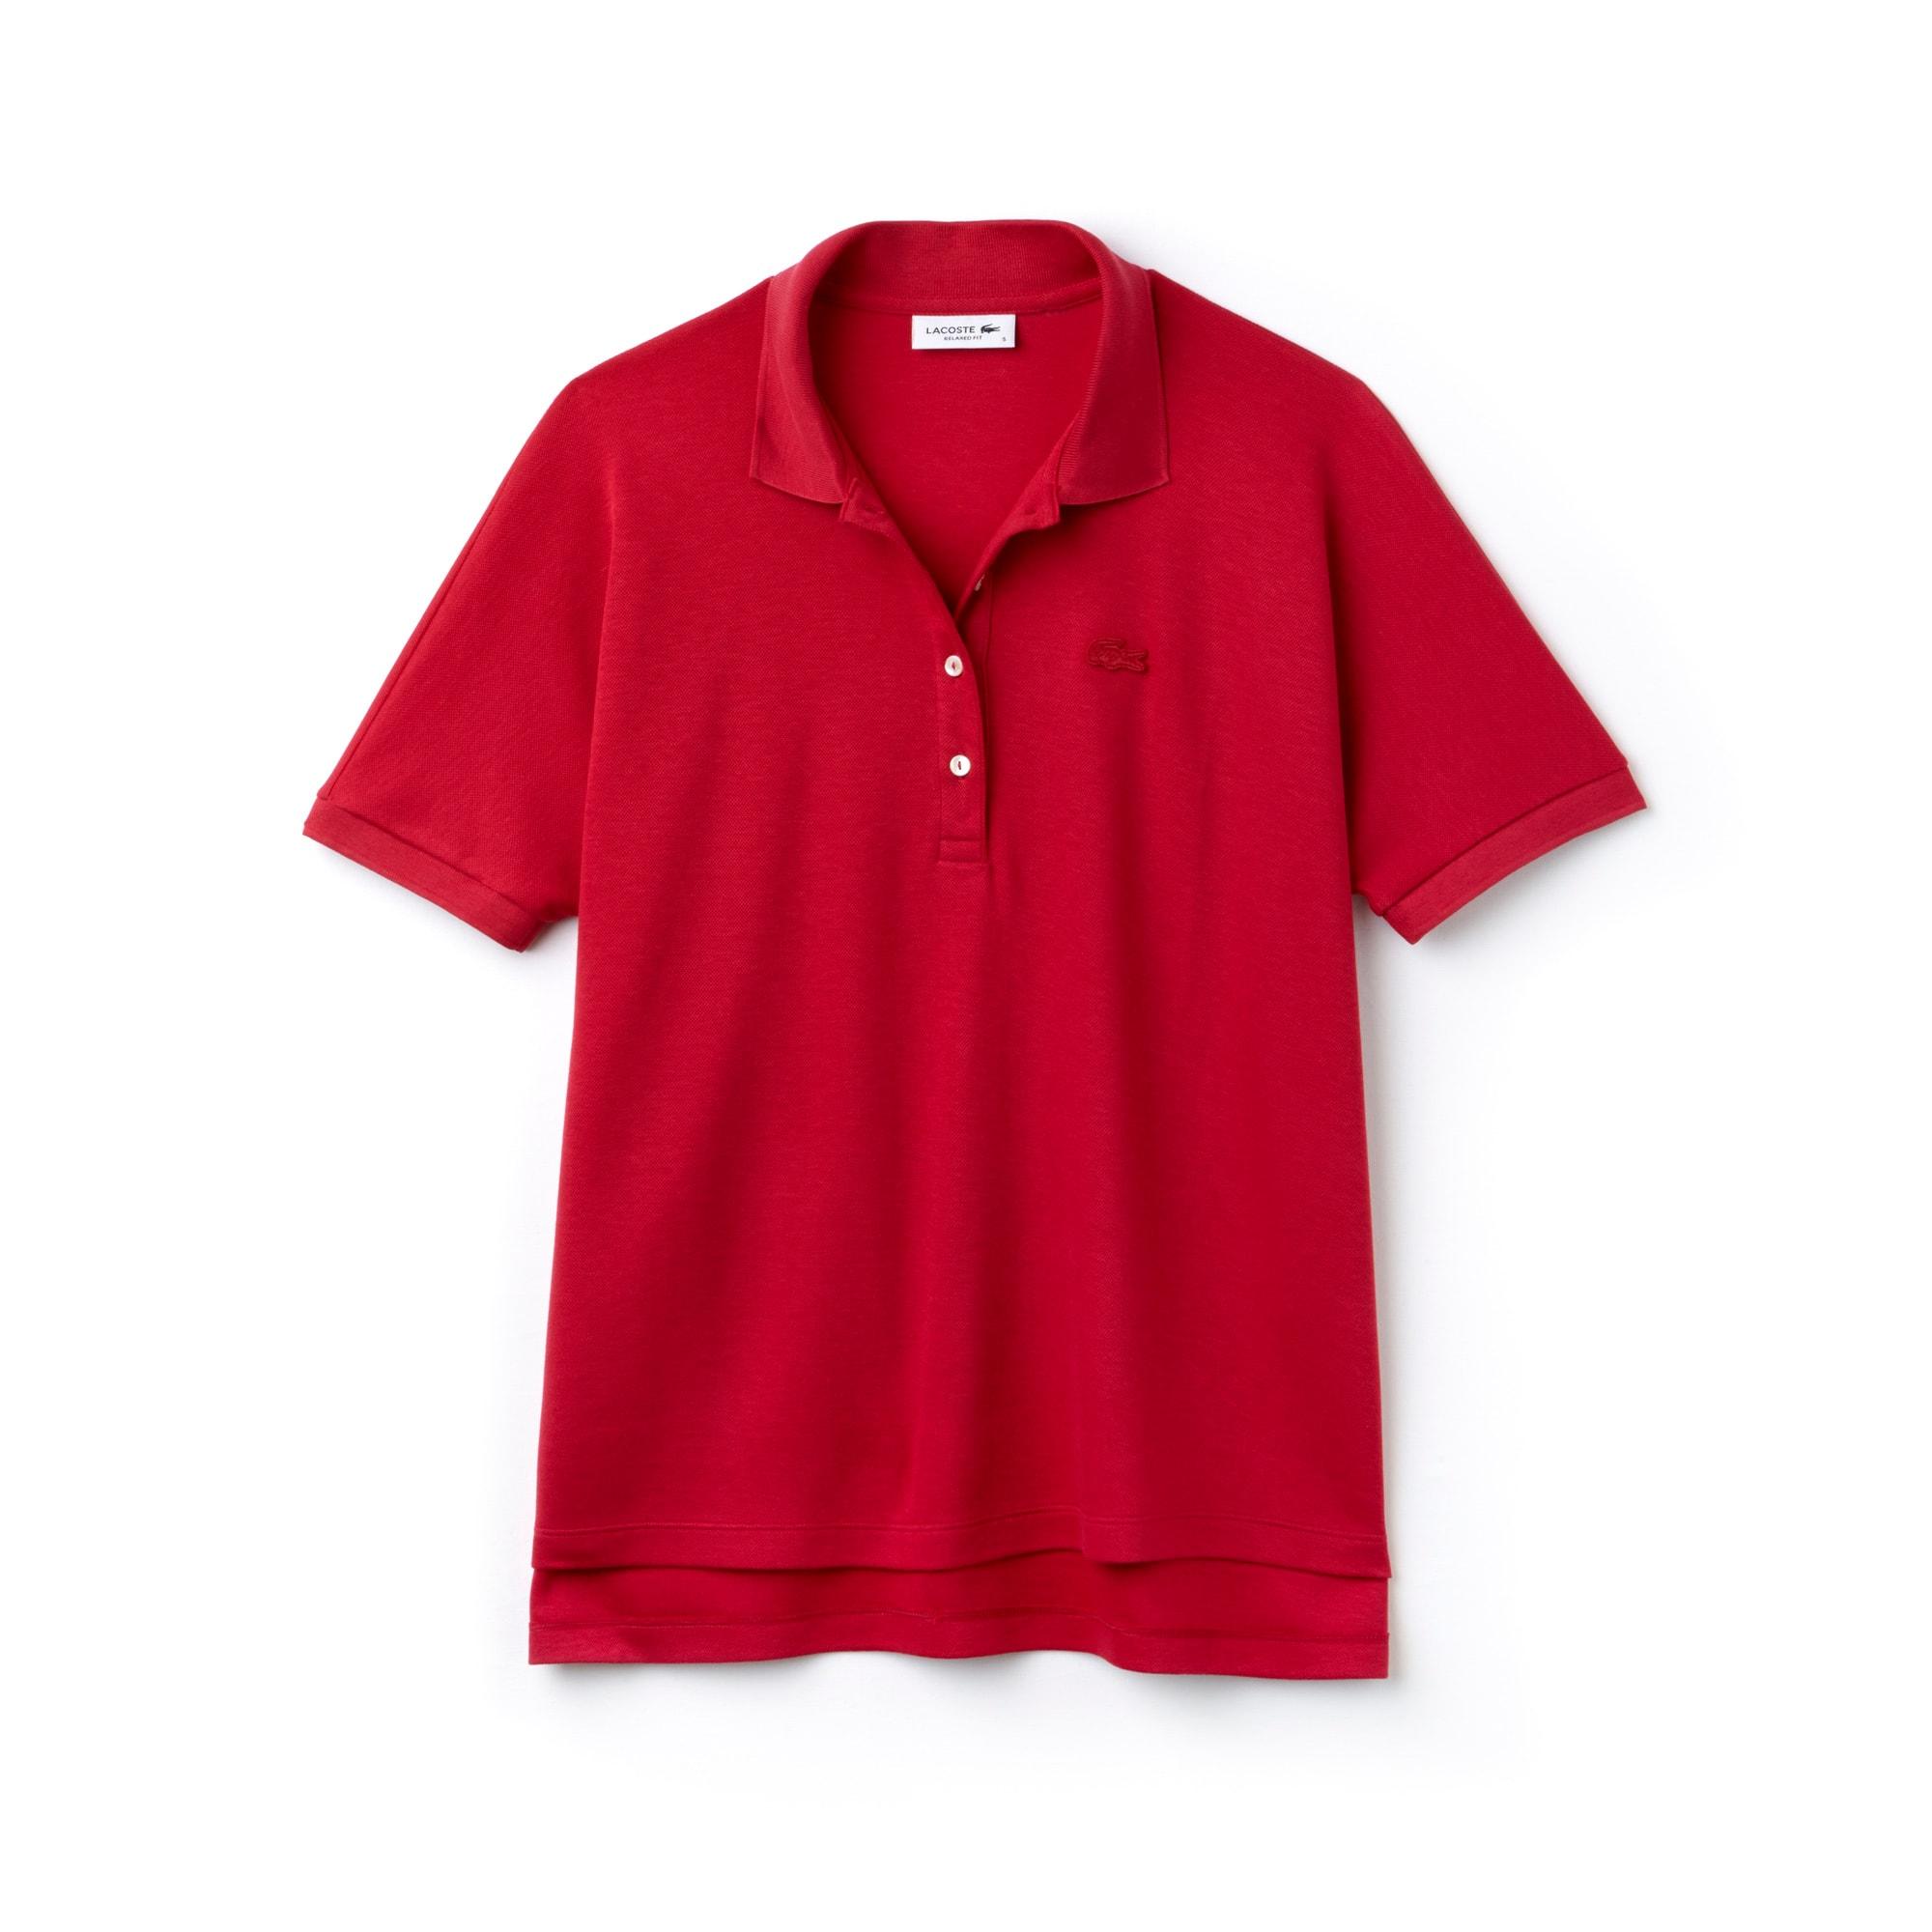 Women's Lacoste Relax Fit Flowing Stretch Cotton Piqué Soft Polo Shirt